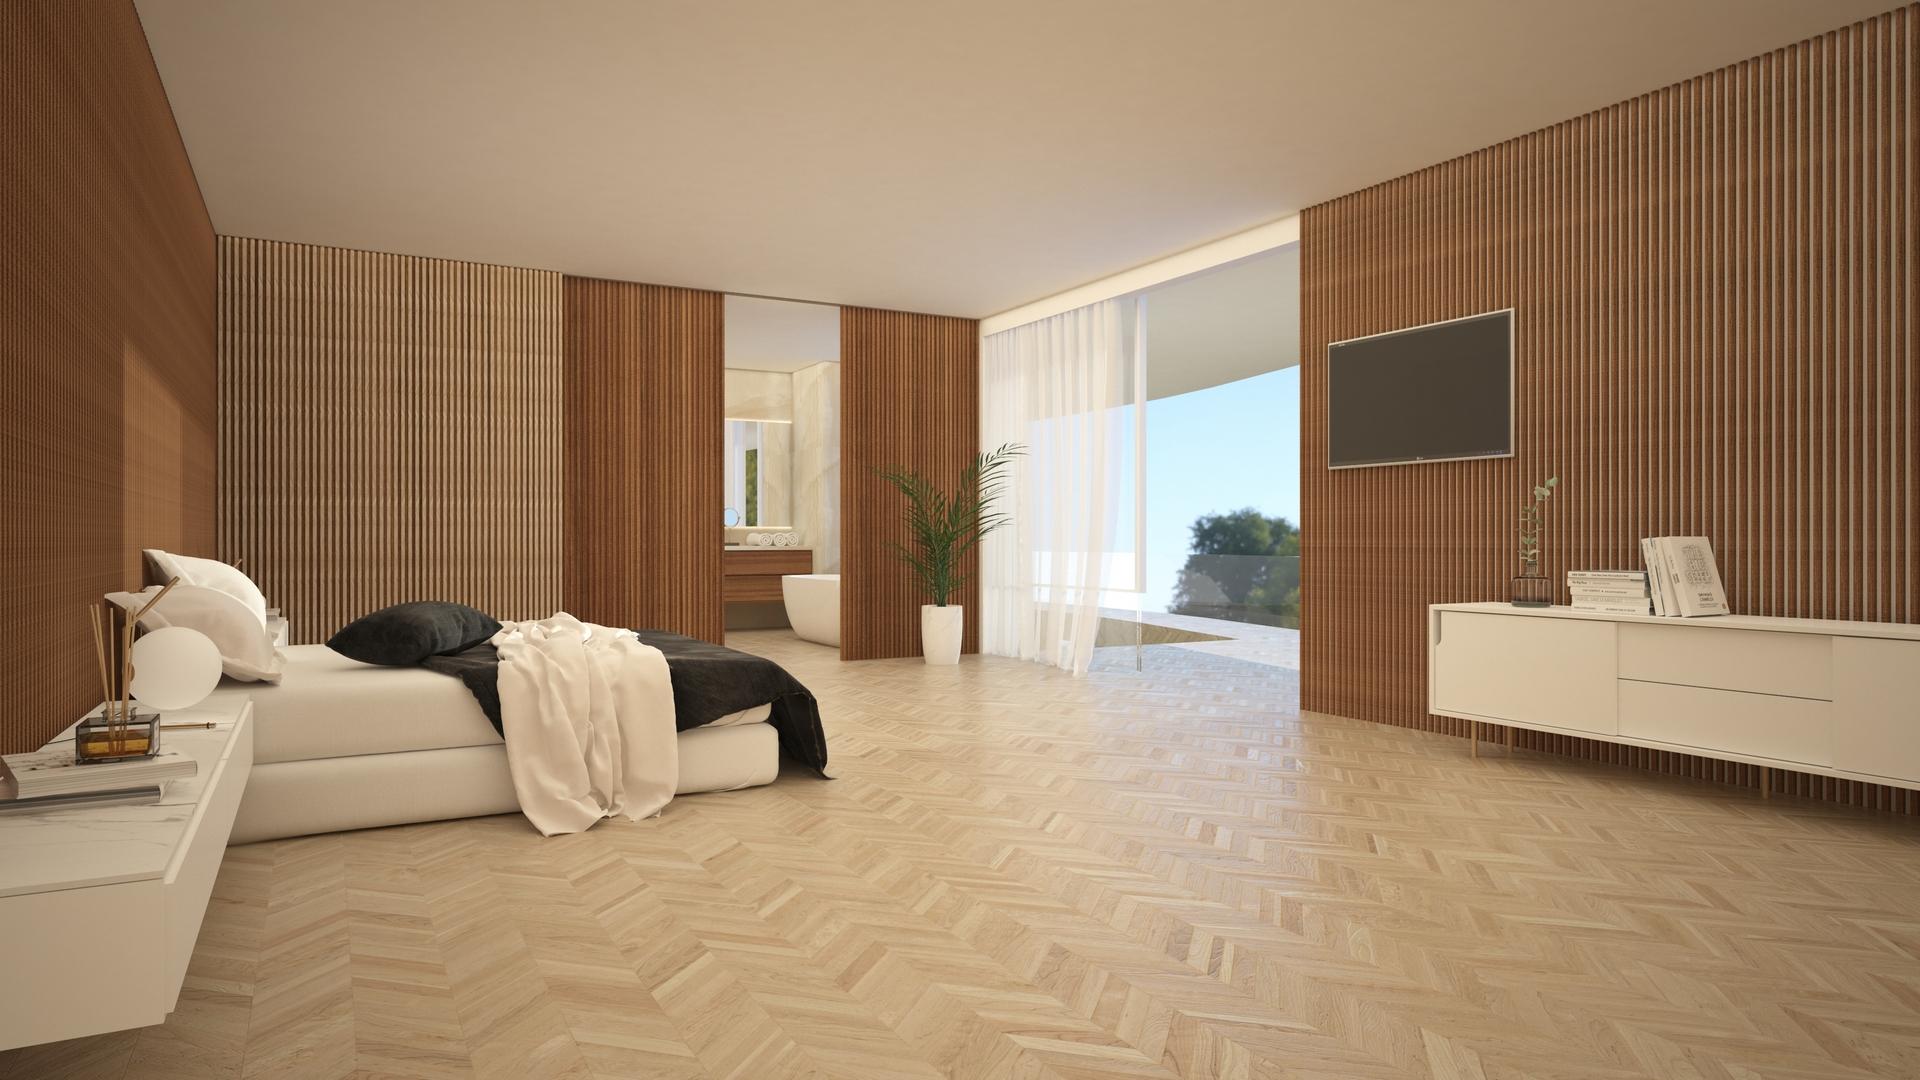 Penthouse - bedroom 2 (Αντιγραφή)